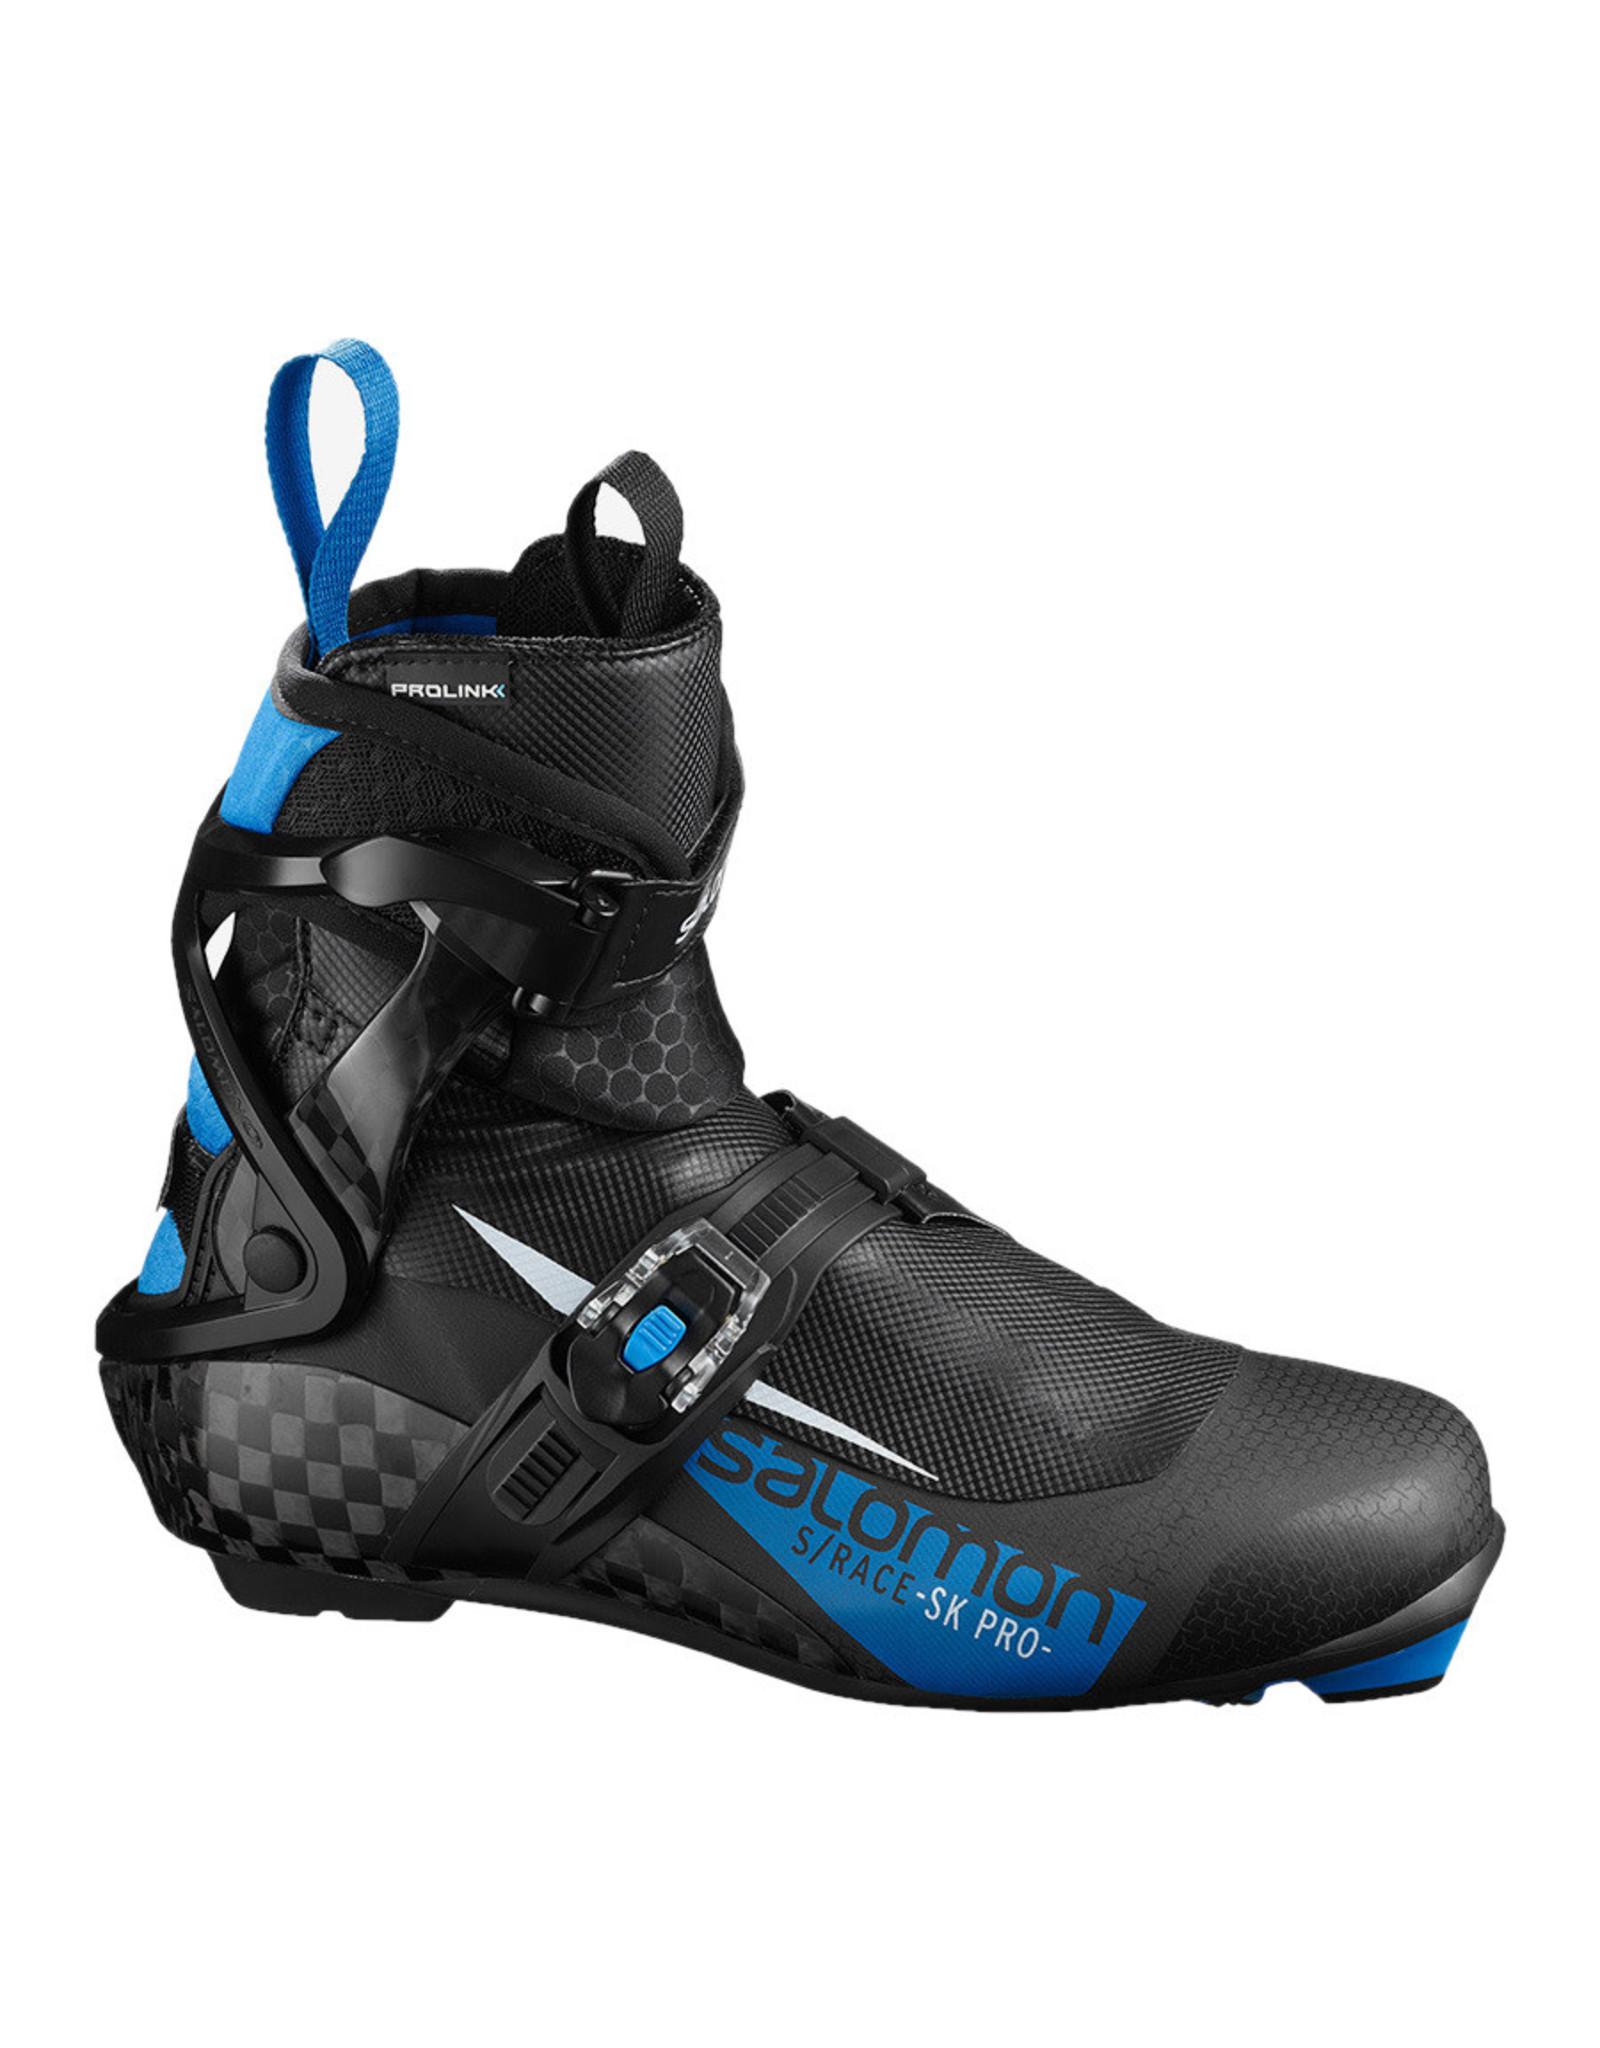 Salomon Salomon S/Race Skate Pro Prolink Boot